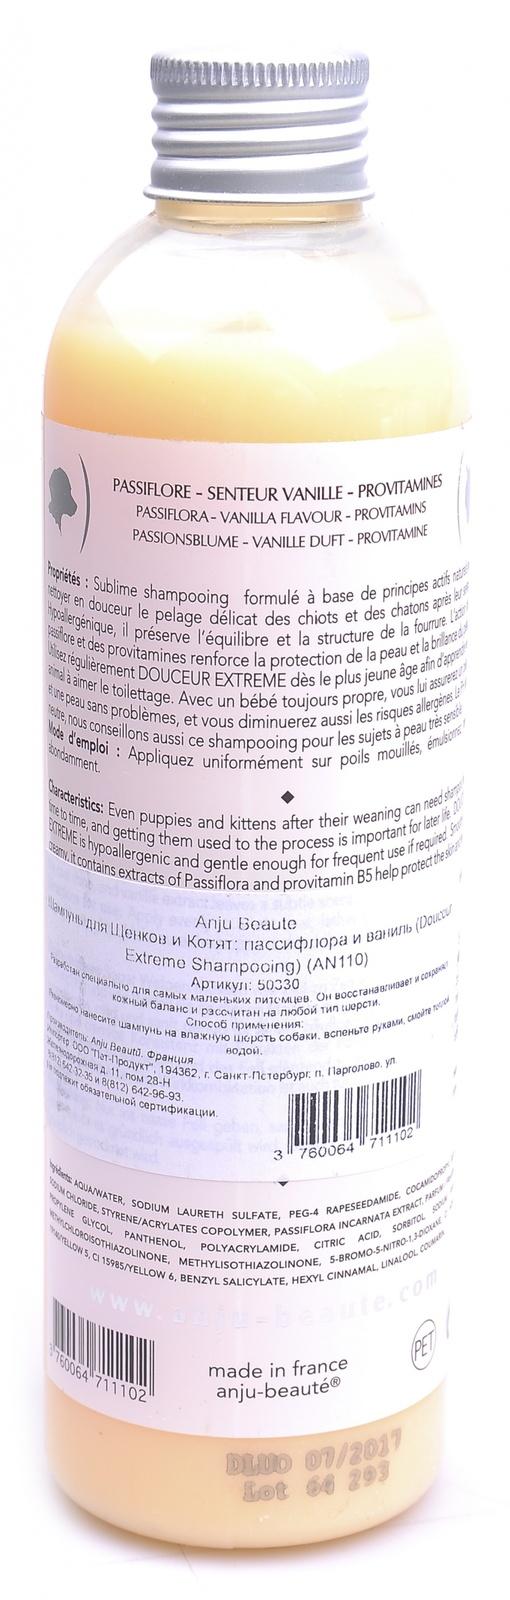 anju beaute Шампунь Anju Beaute для щенков и котят: пассифлора и ваниль Douceur Extreme Shampooing, 5л 50368